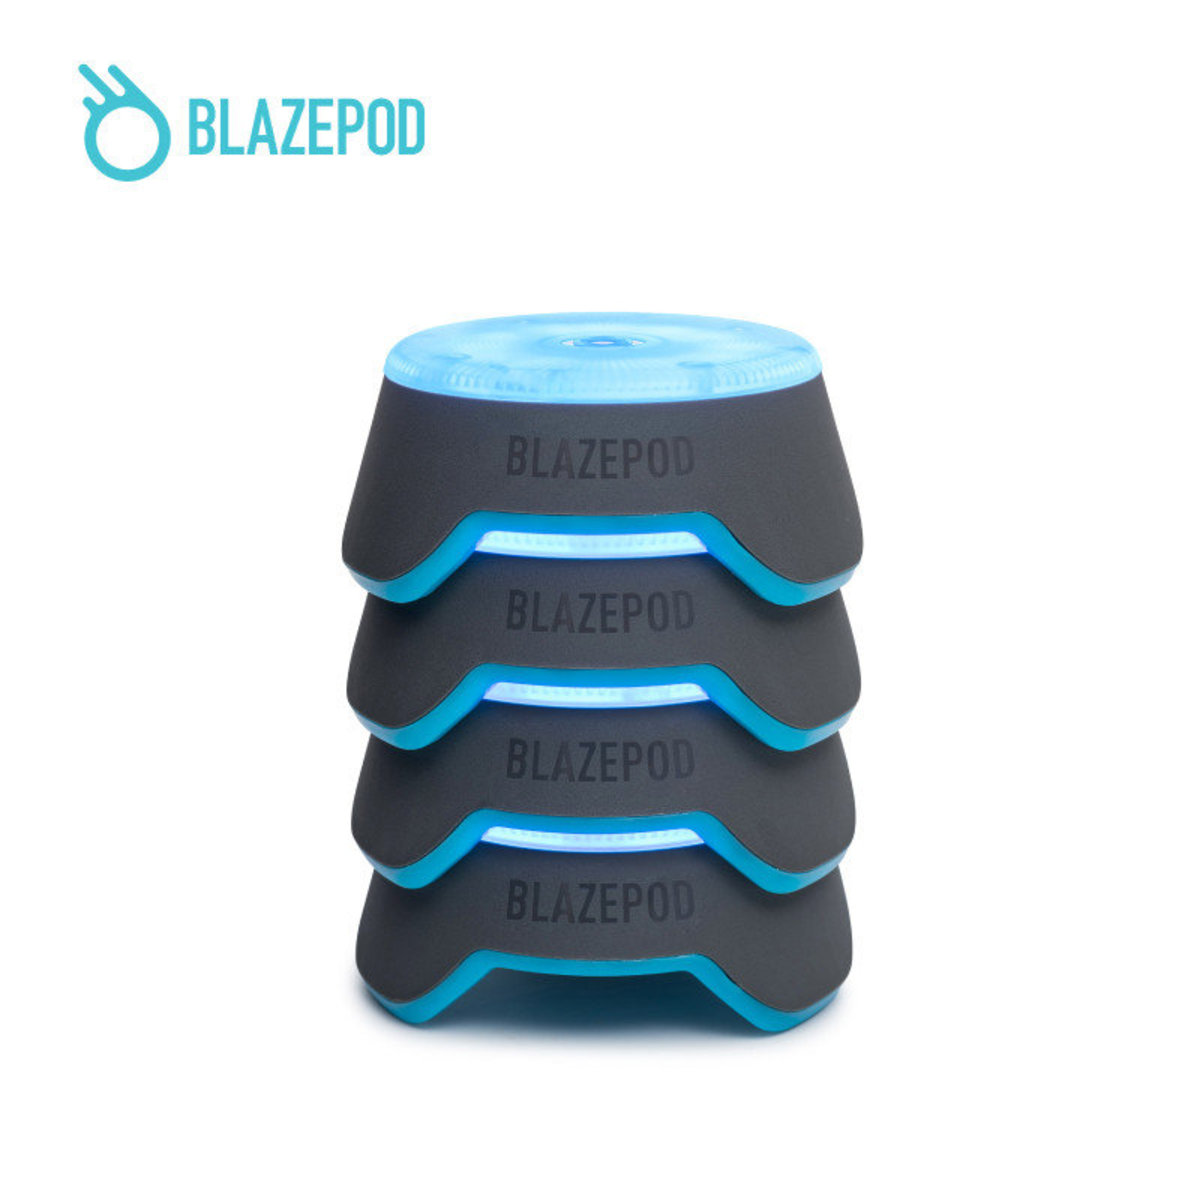 BlazePod 反應燈訓練組合 (4燈)